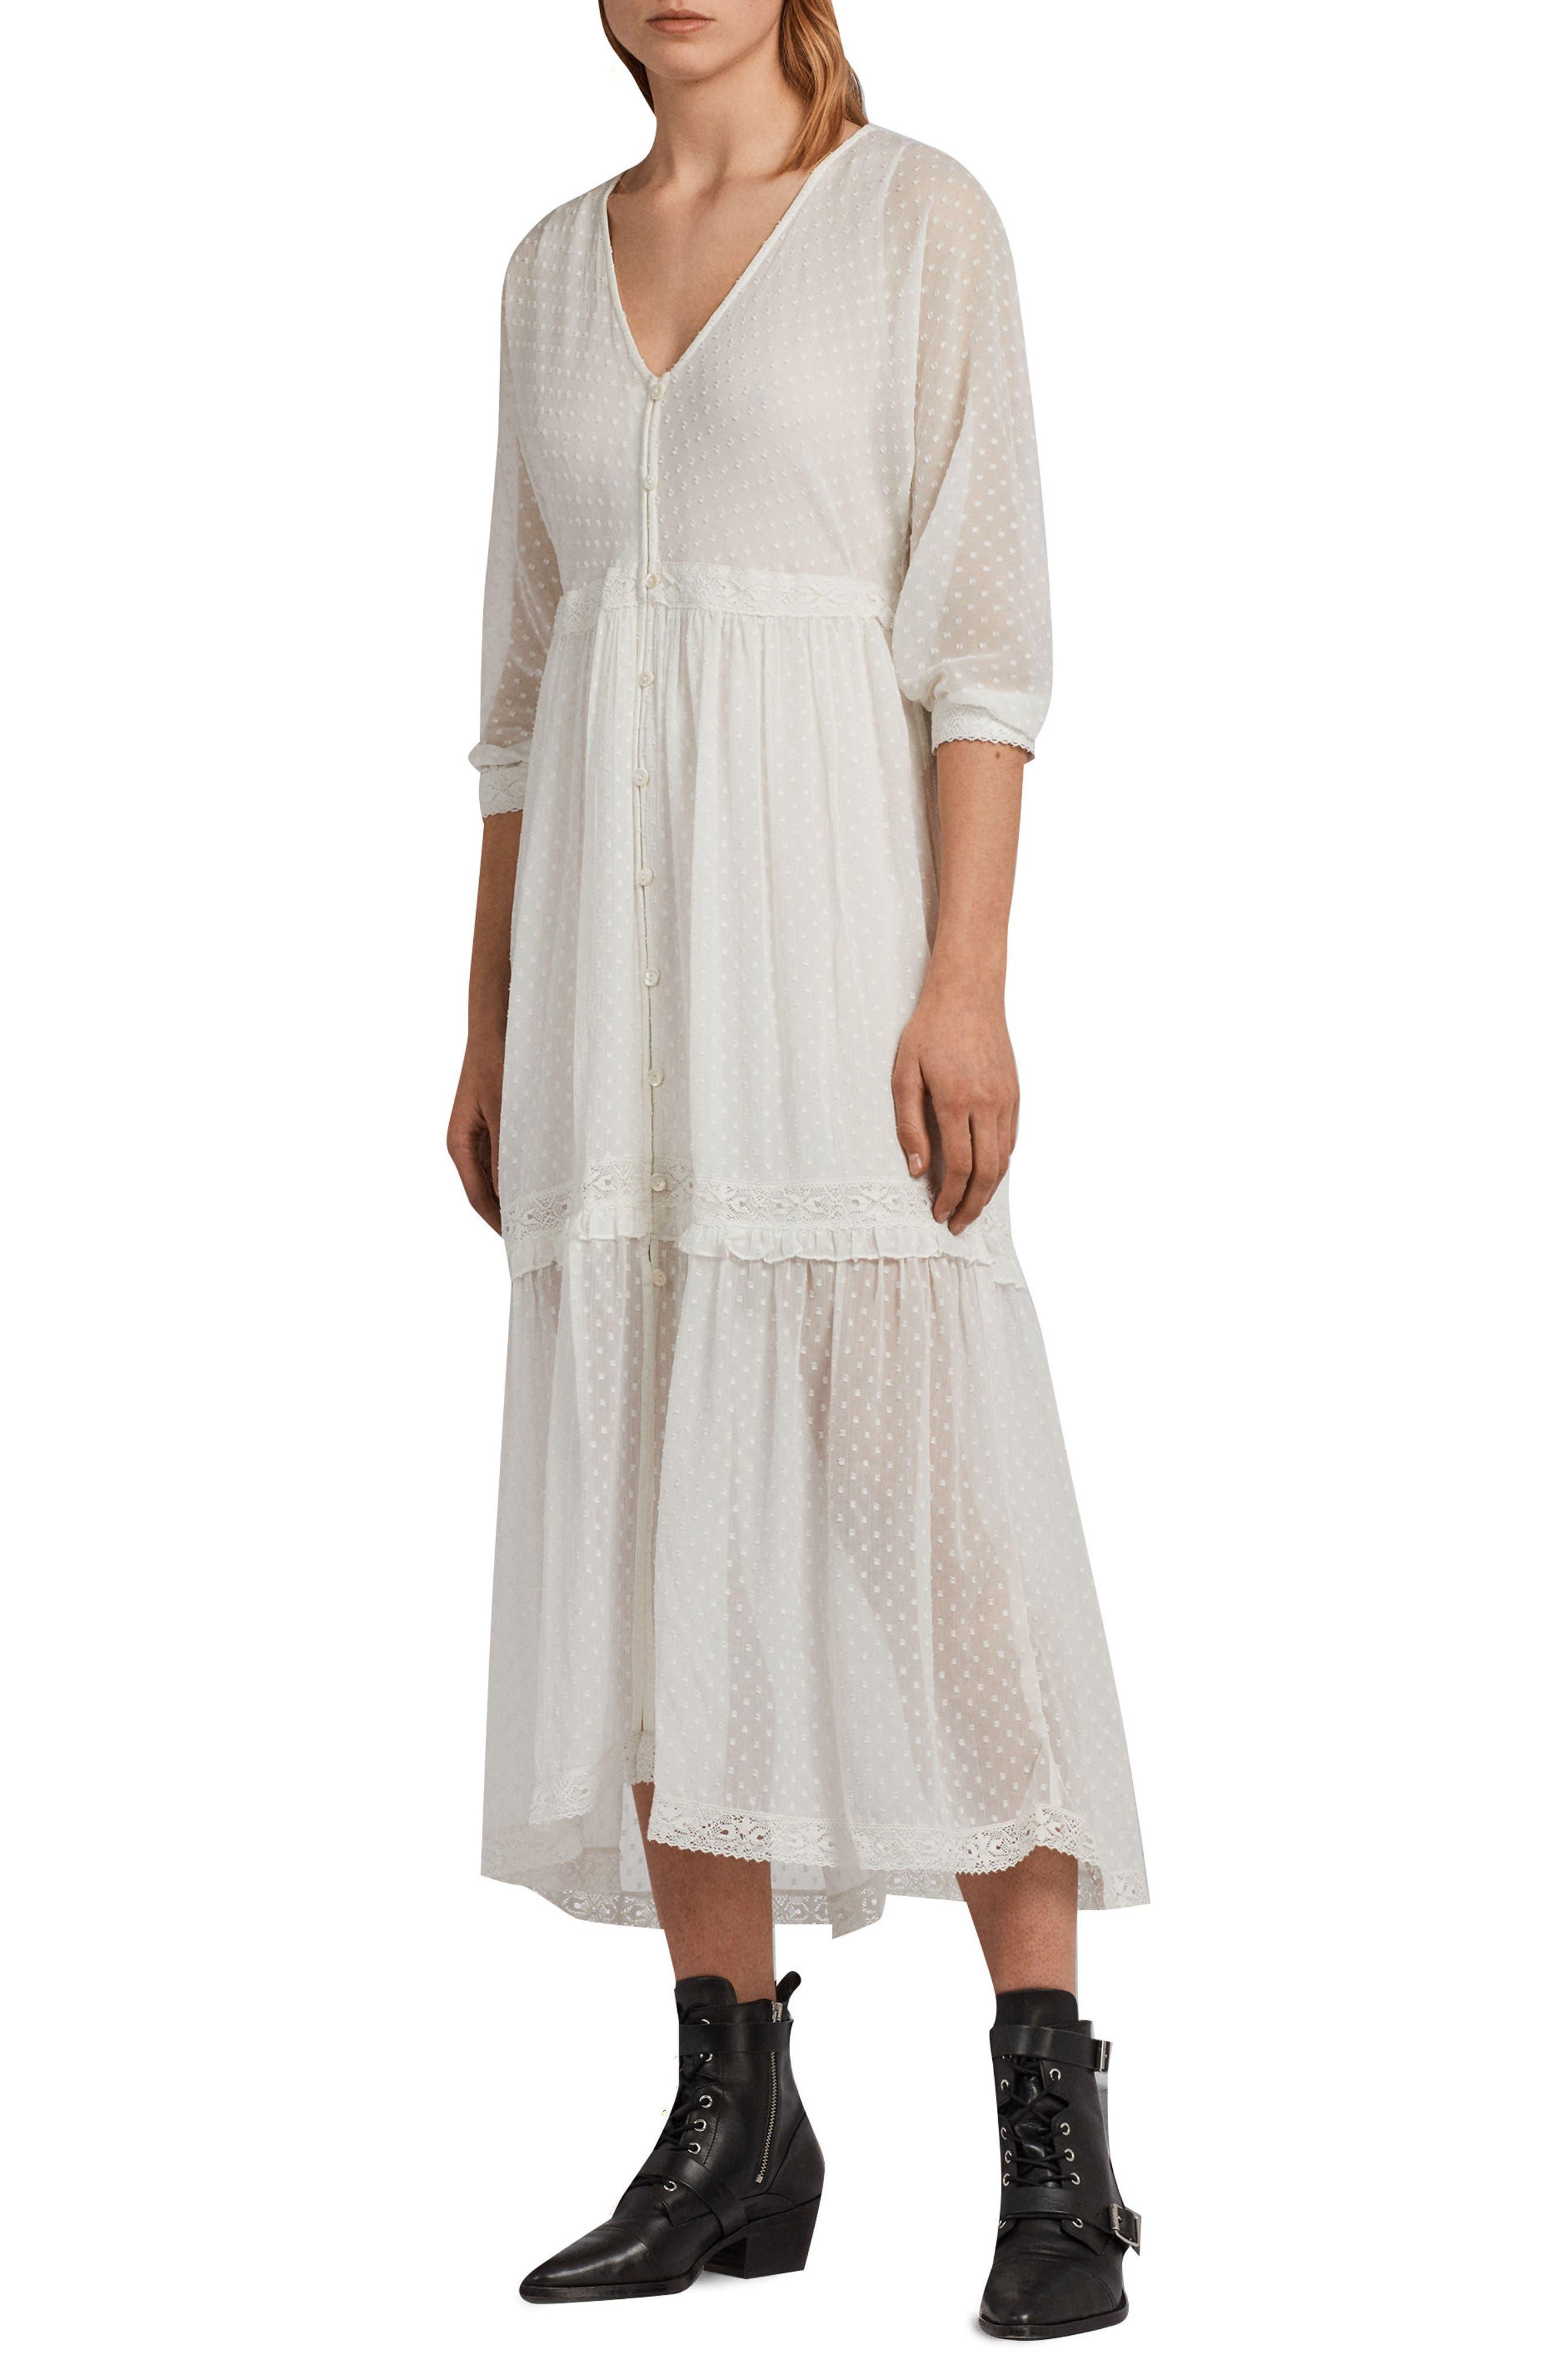 Palma Polka Dot Dress,                             Main thumbnail 1, color,                             Chalk White